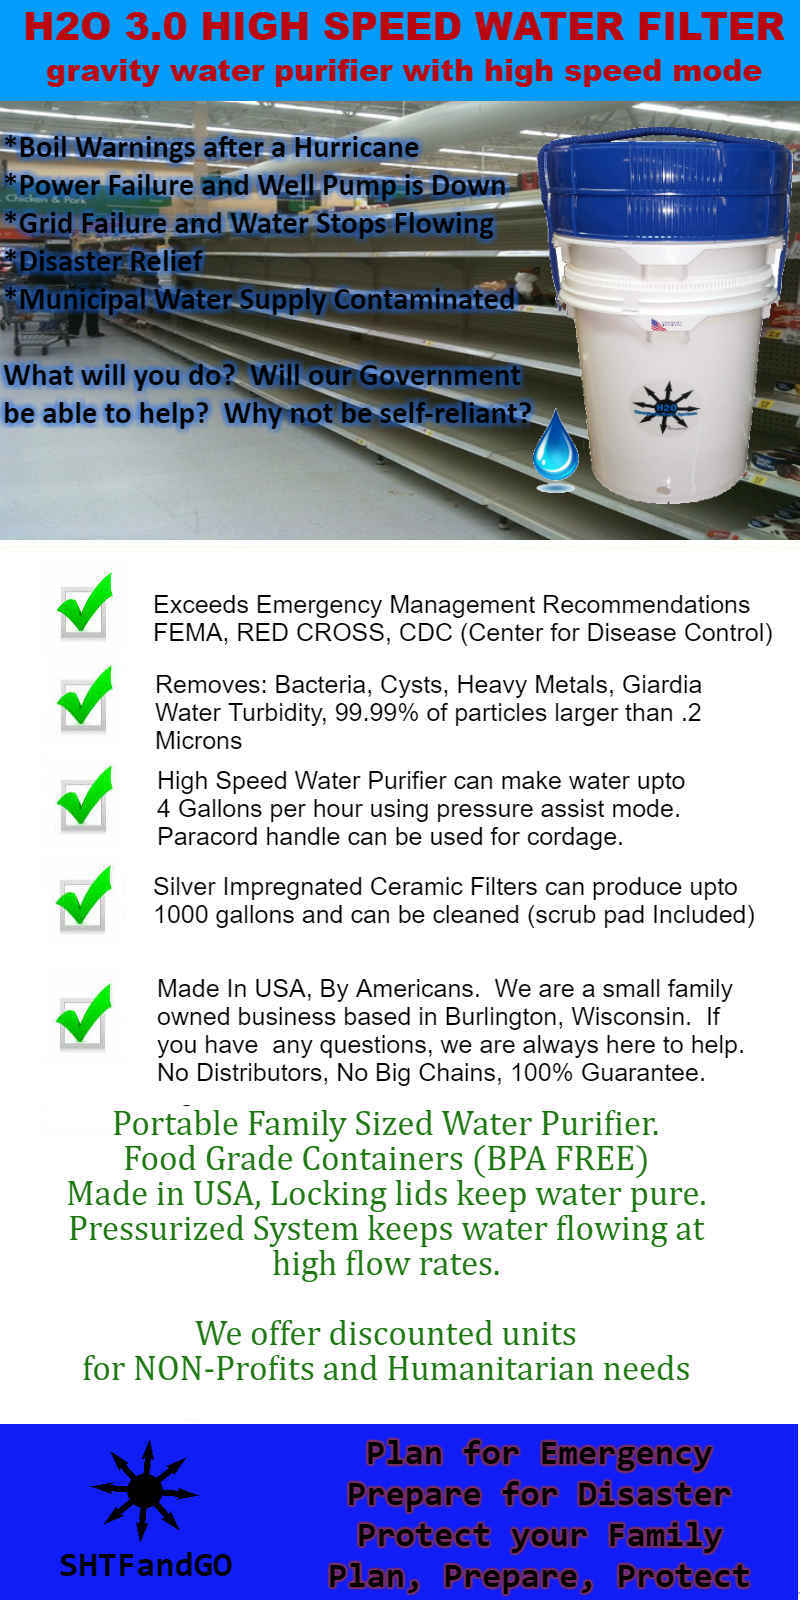 H2O 3.0 Emergency High Speed Water Purifier